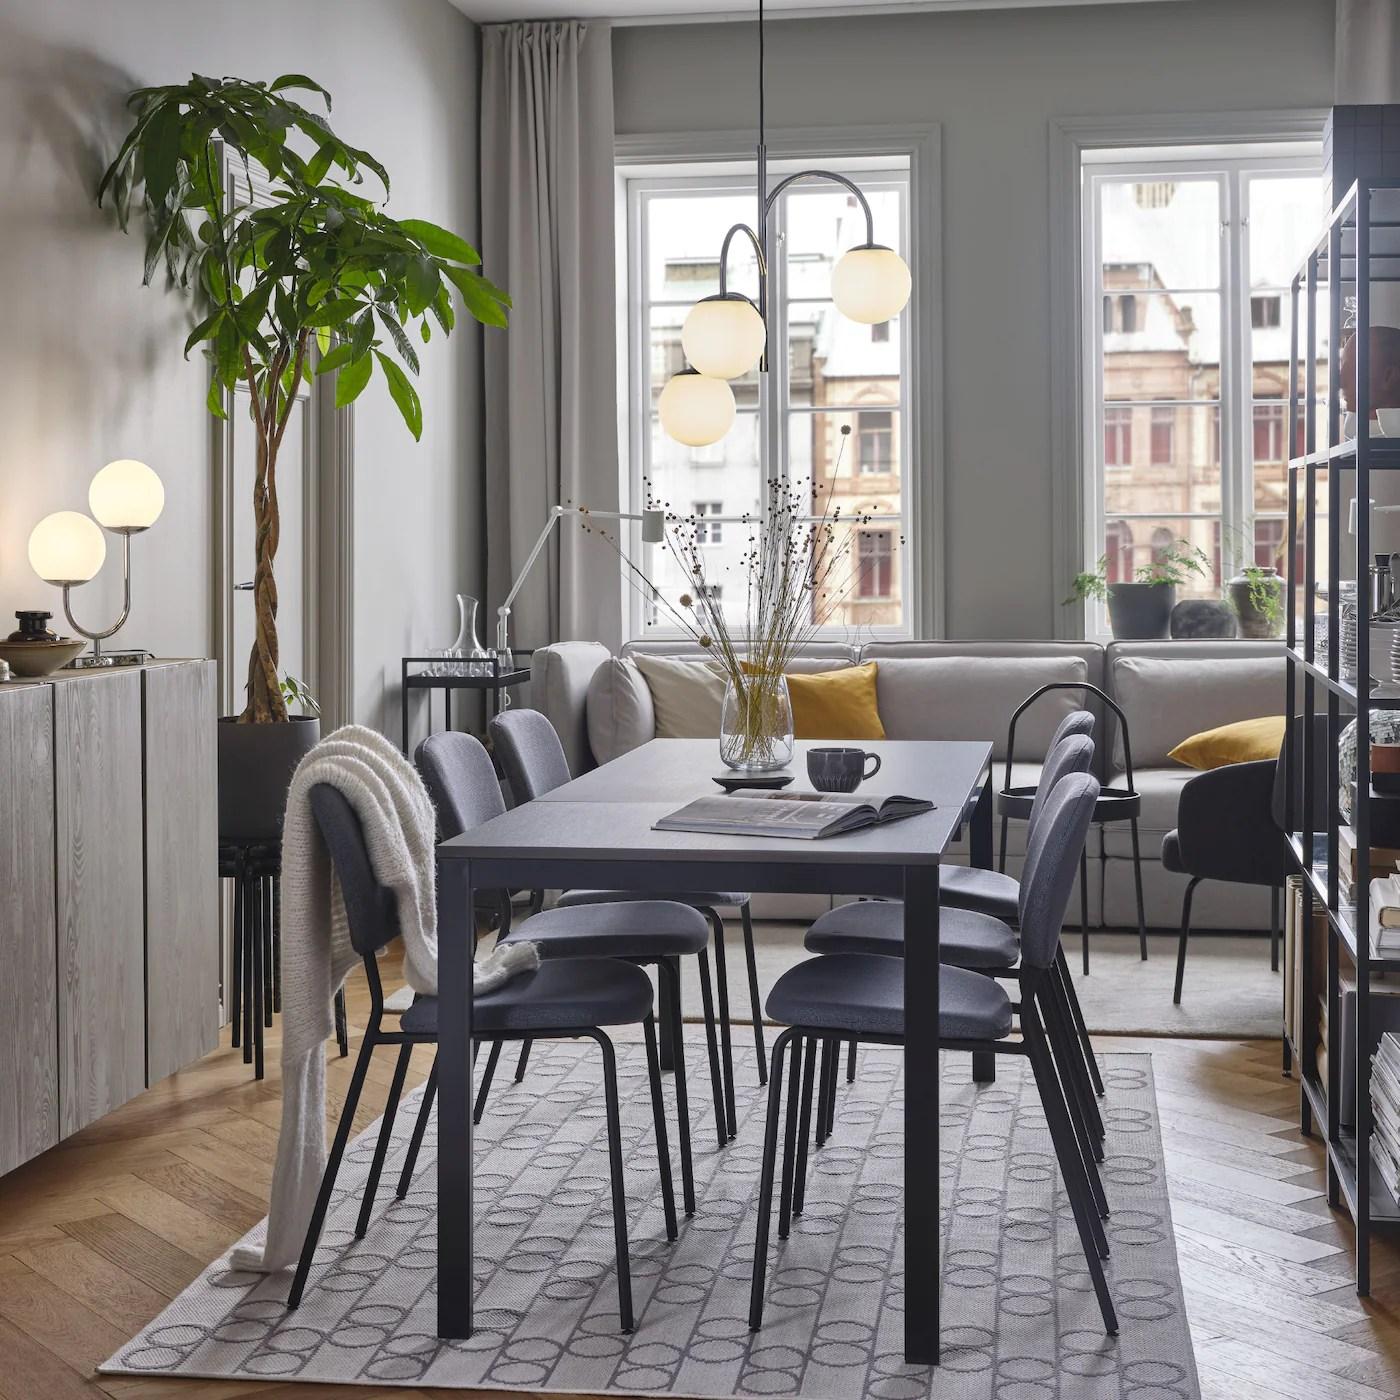 Dining Room Design Gallery Uae Ikea